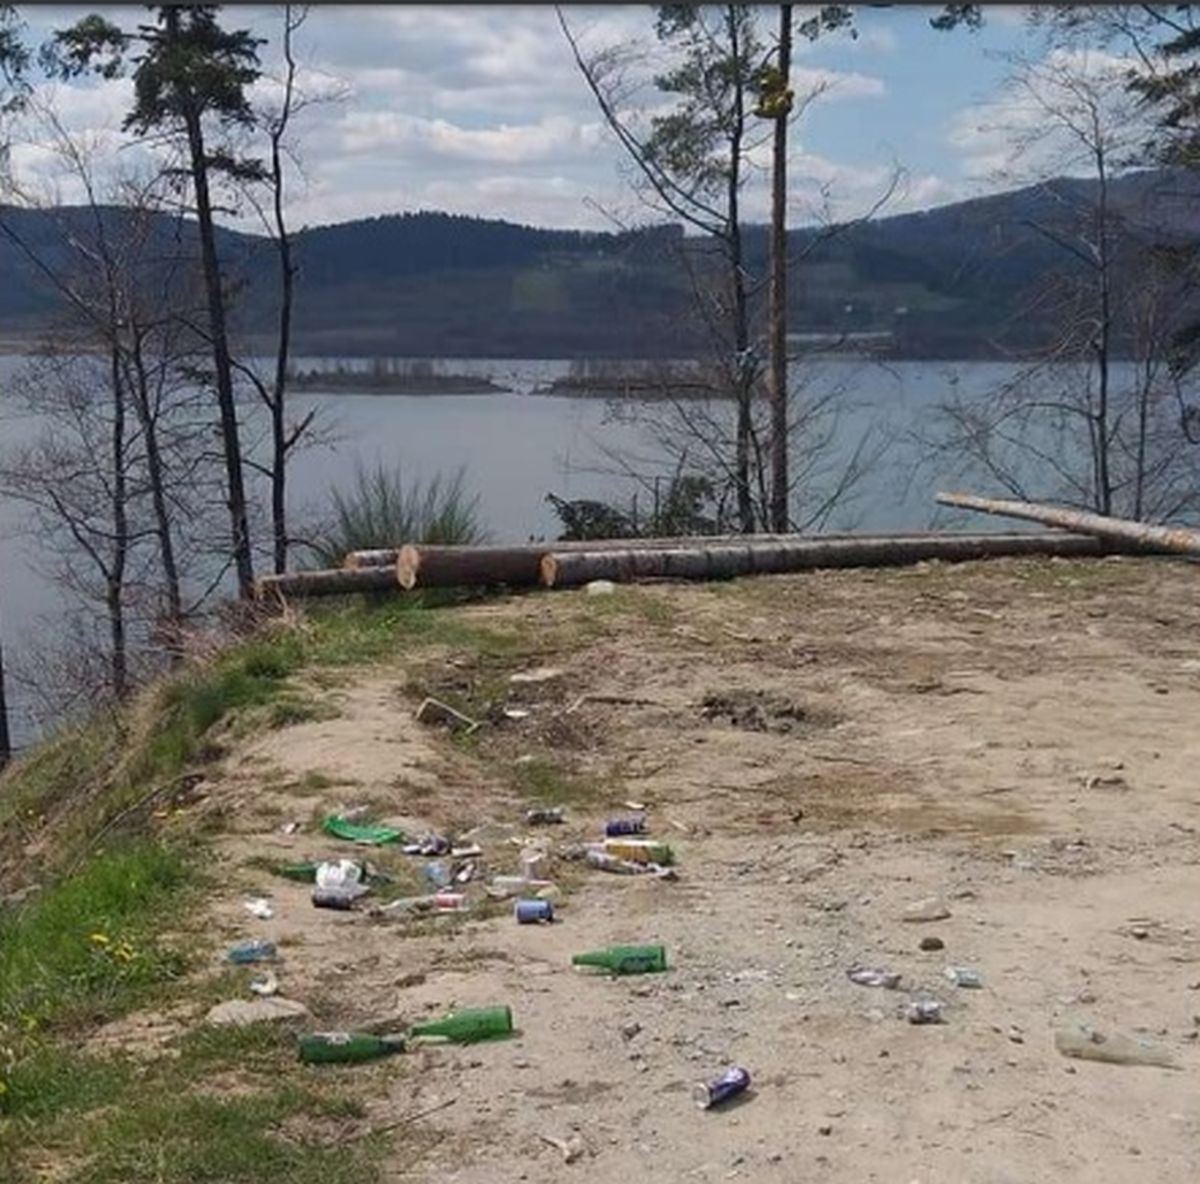 Koszmar nad Jeziorem Mucharskim! [FOTO]